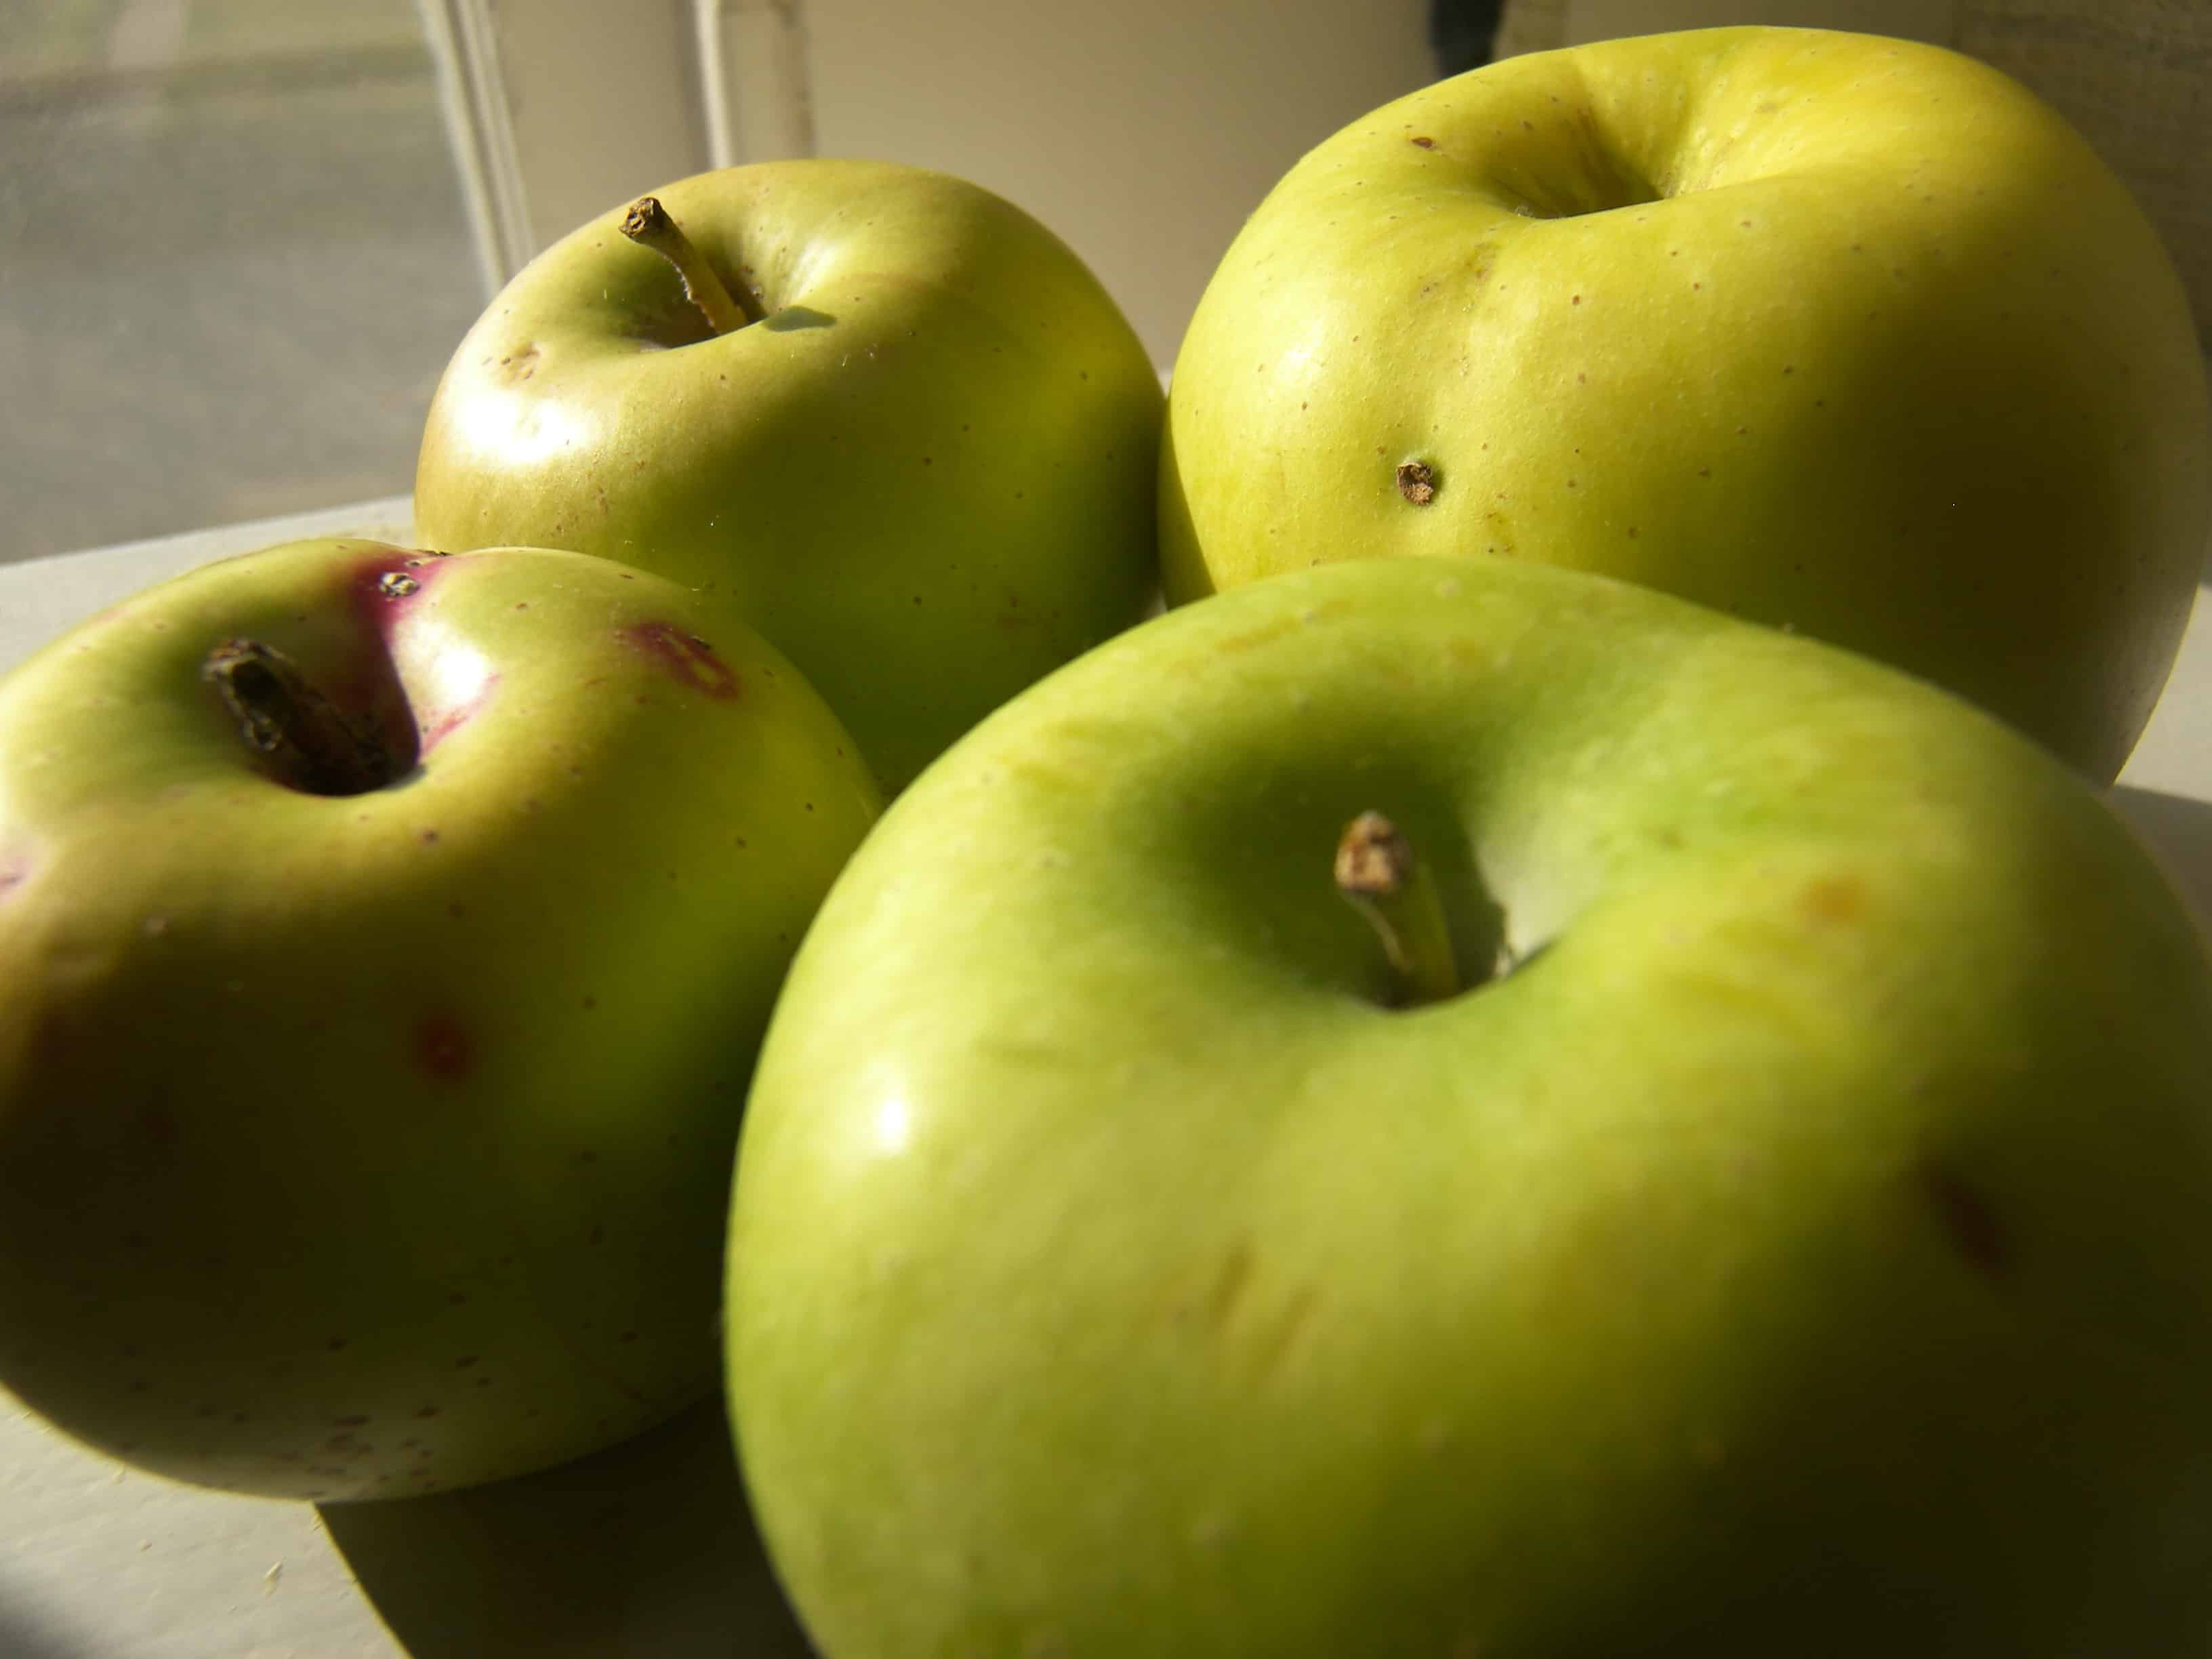 Rhode Island Greening Apples